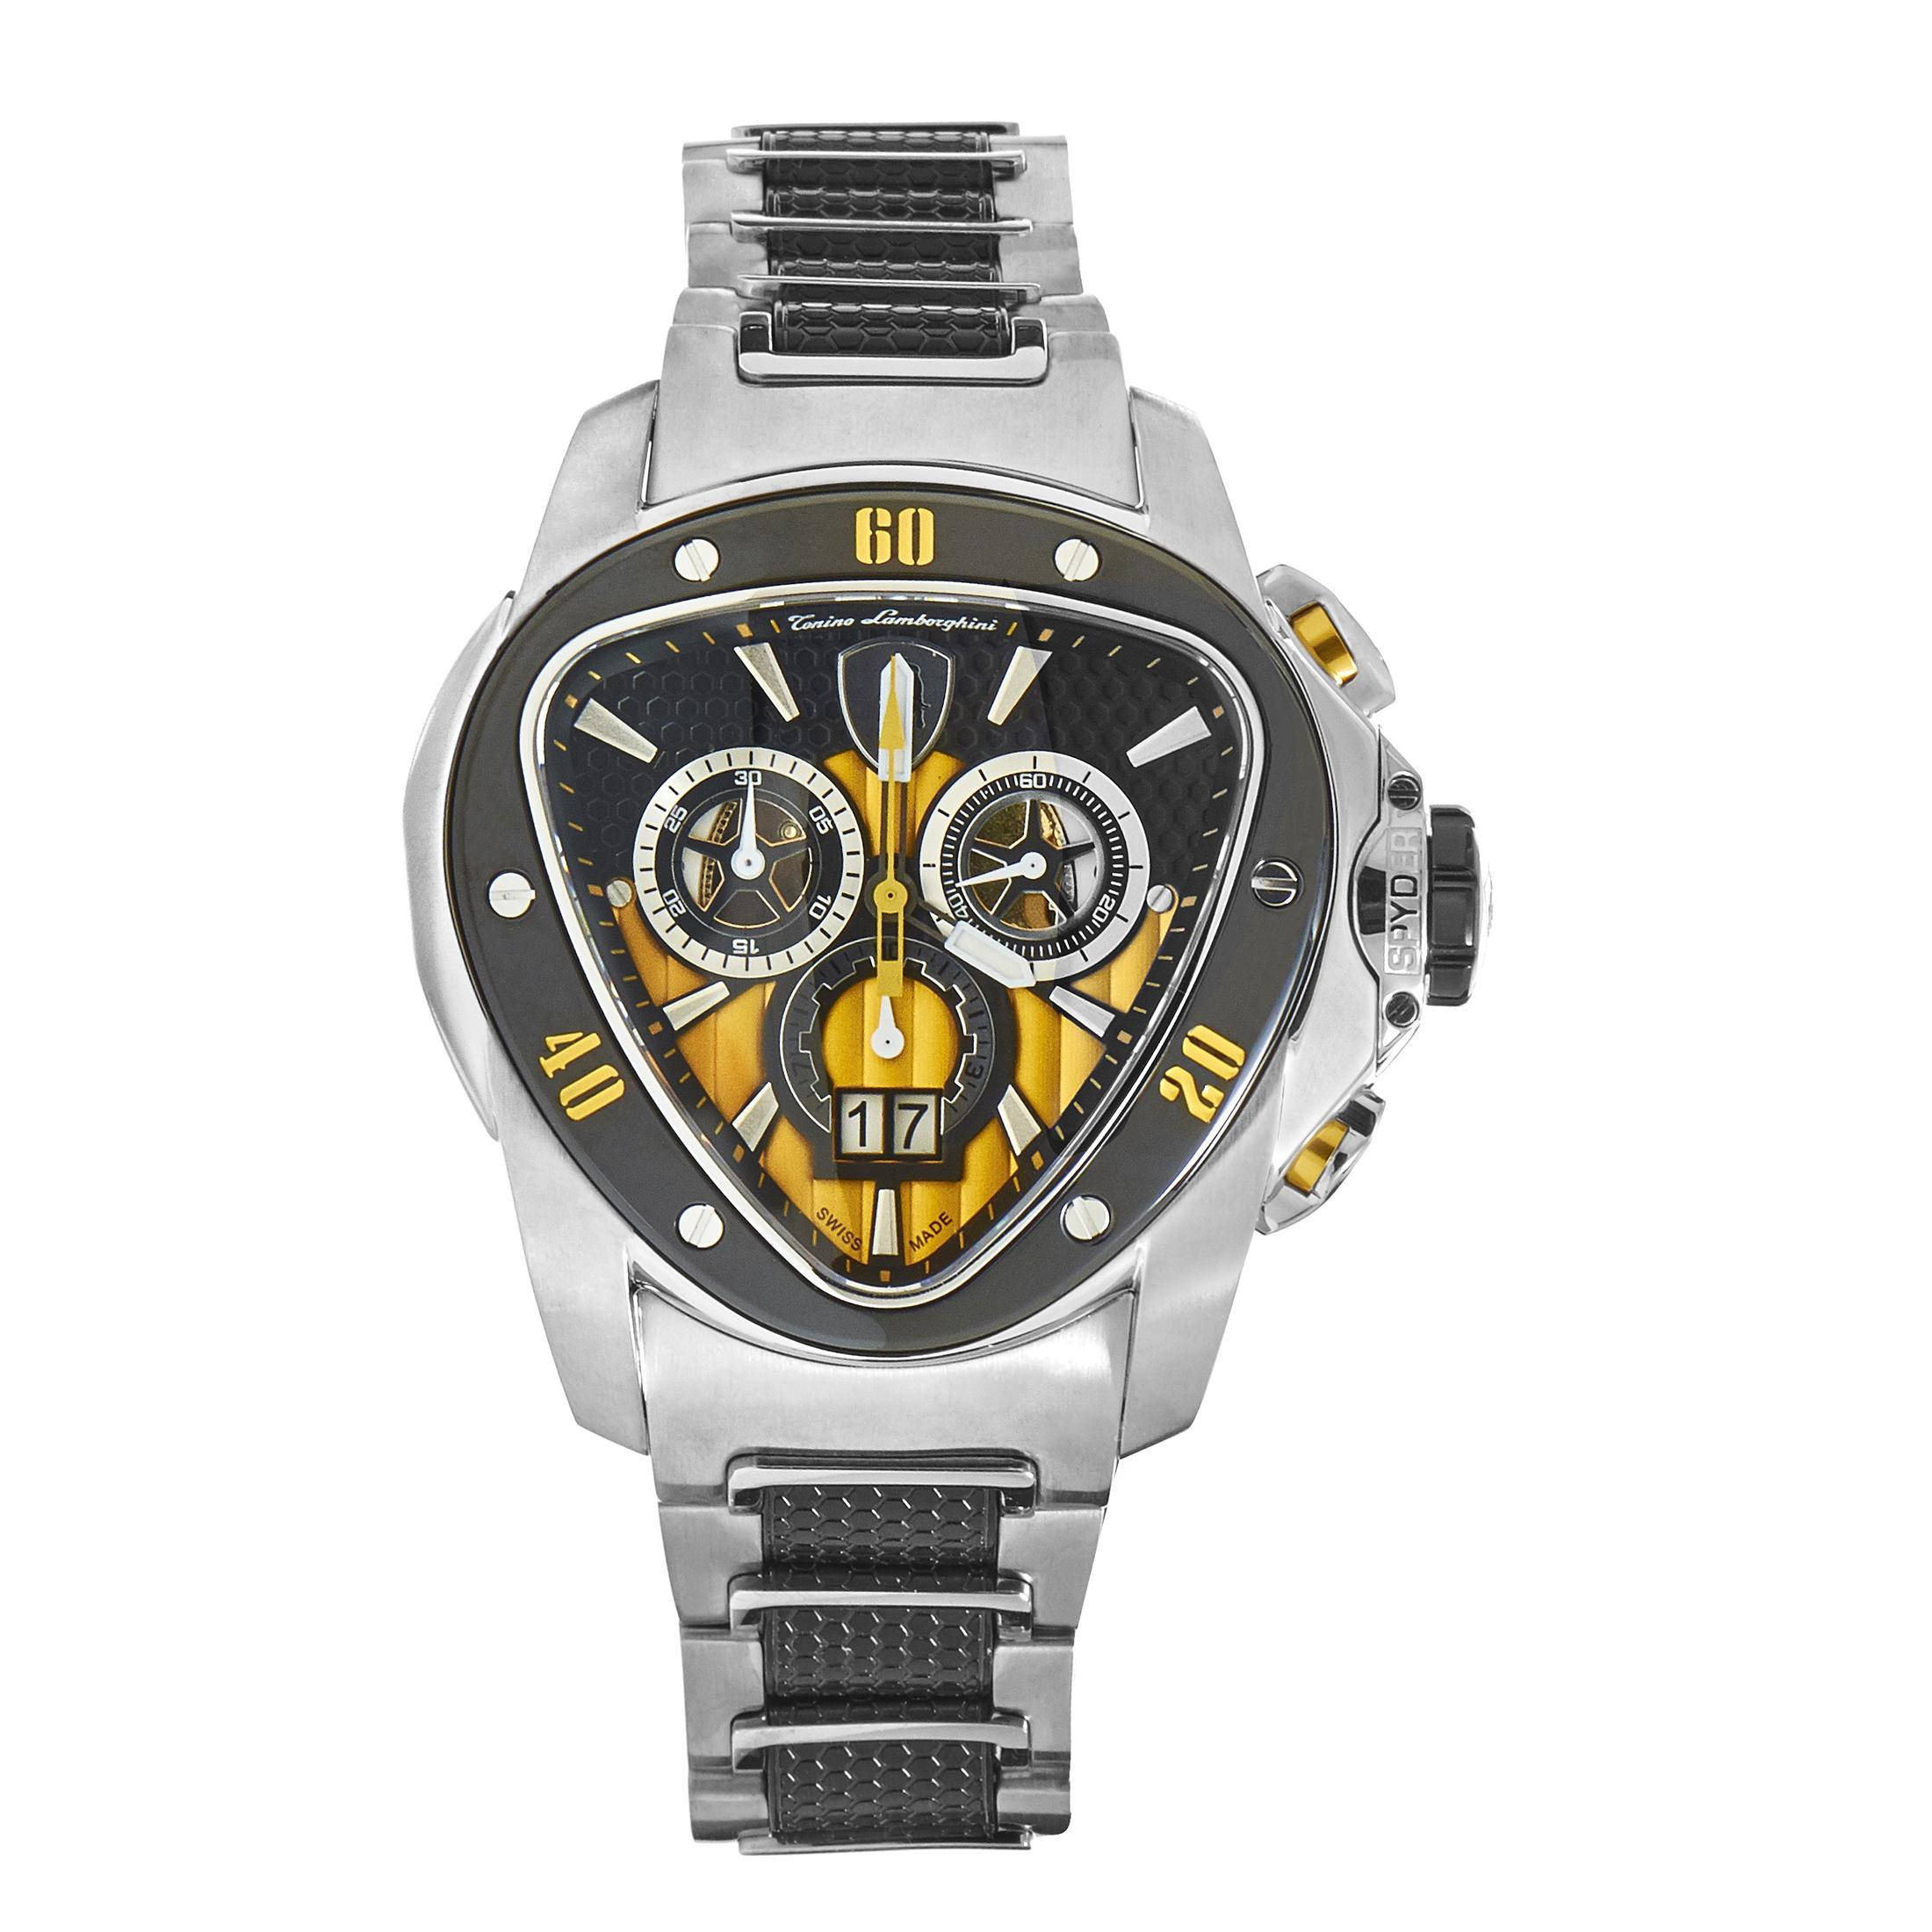 Spyder Men's Quartz Chronograph Watch 1100 1116